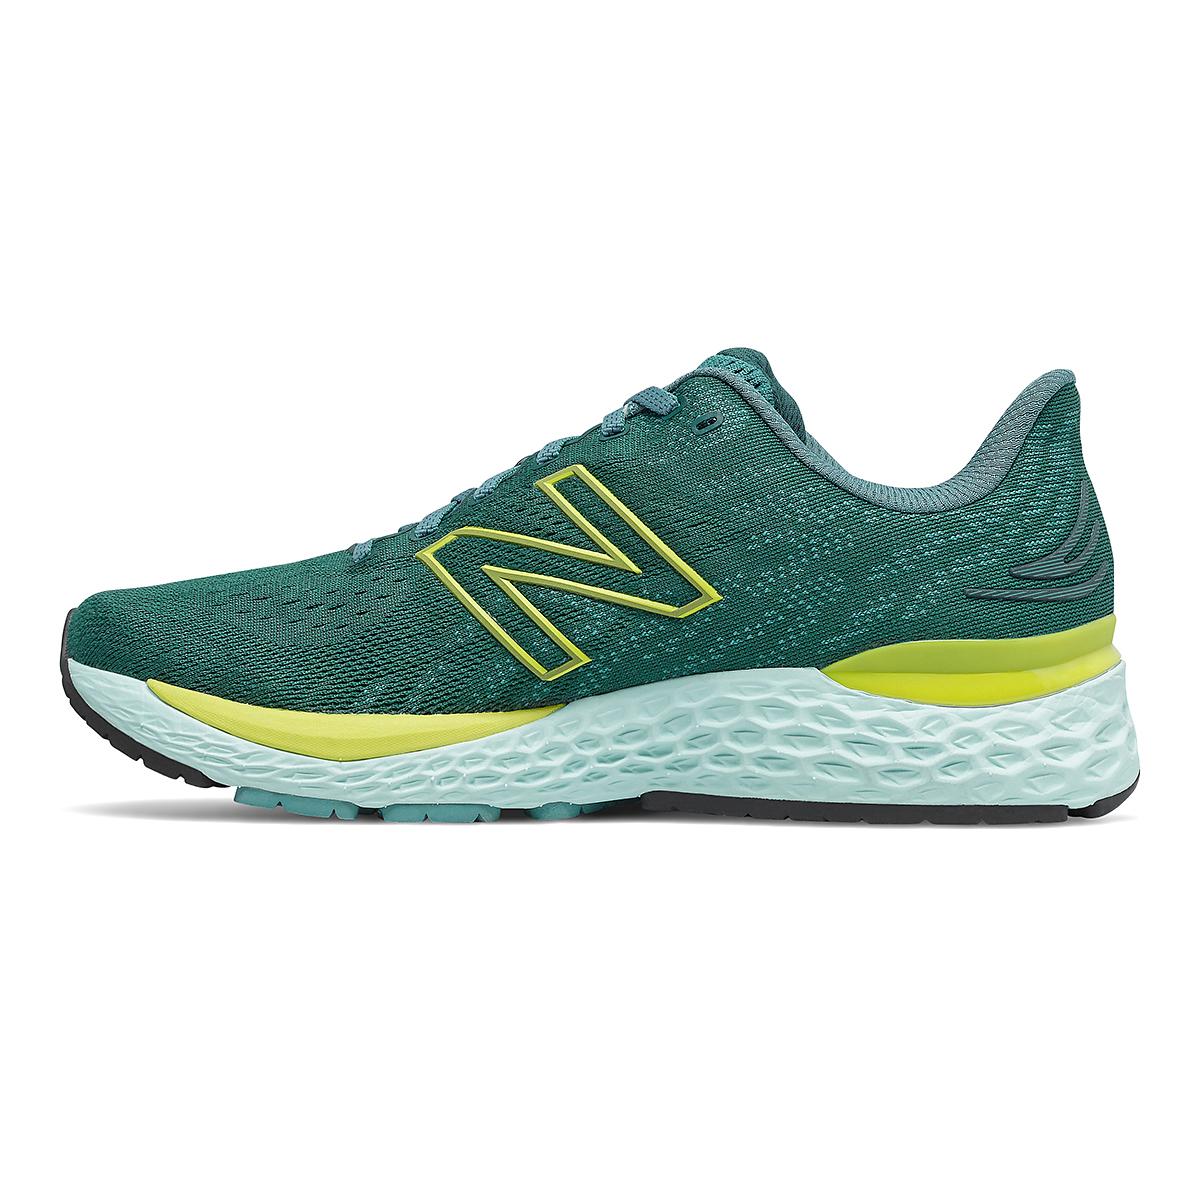 Men's New Balance Fresh Foam 880v11 Running Shoe - Color: Trek/Sulpher Yellow - Size: 7 - Width: Wide, Trek/Sulpher Yellow, large, image 2